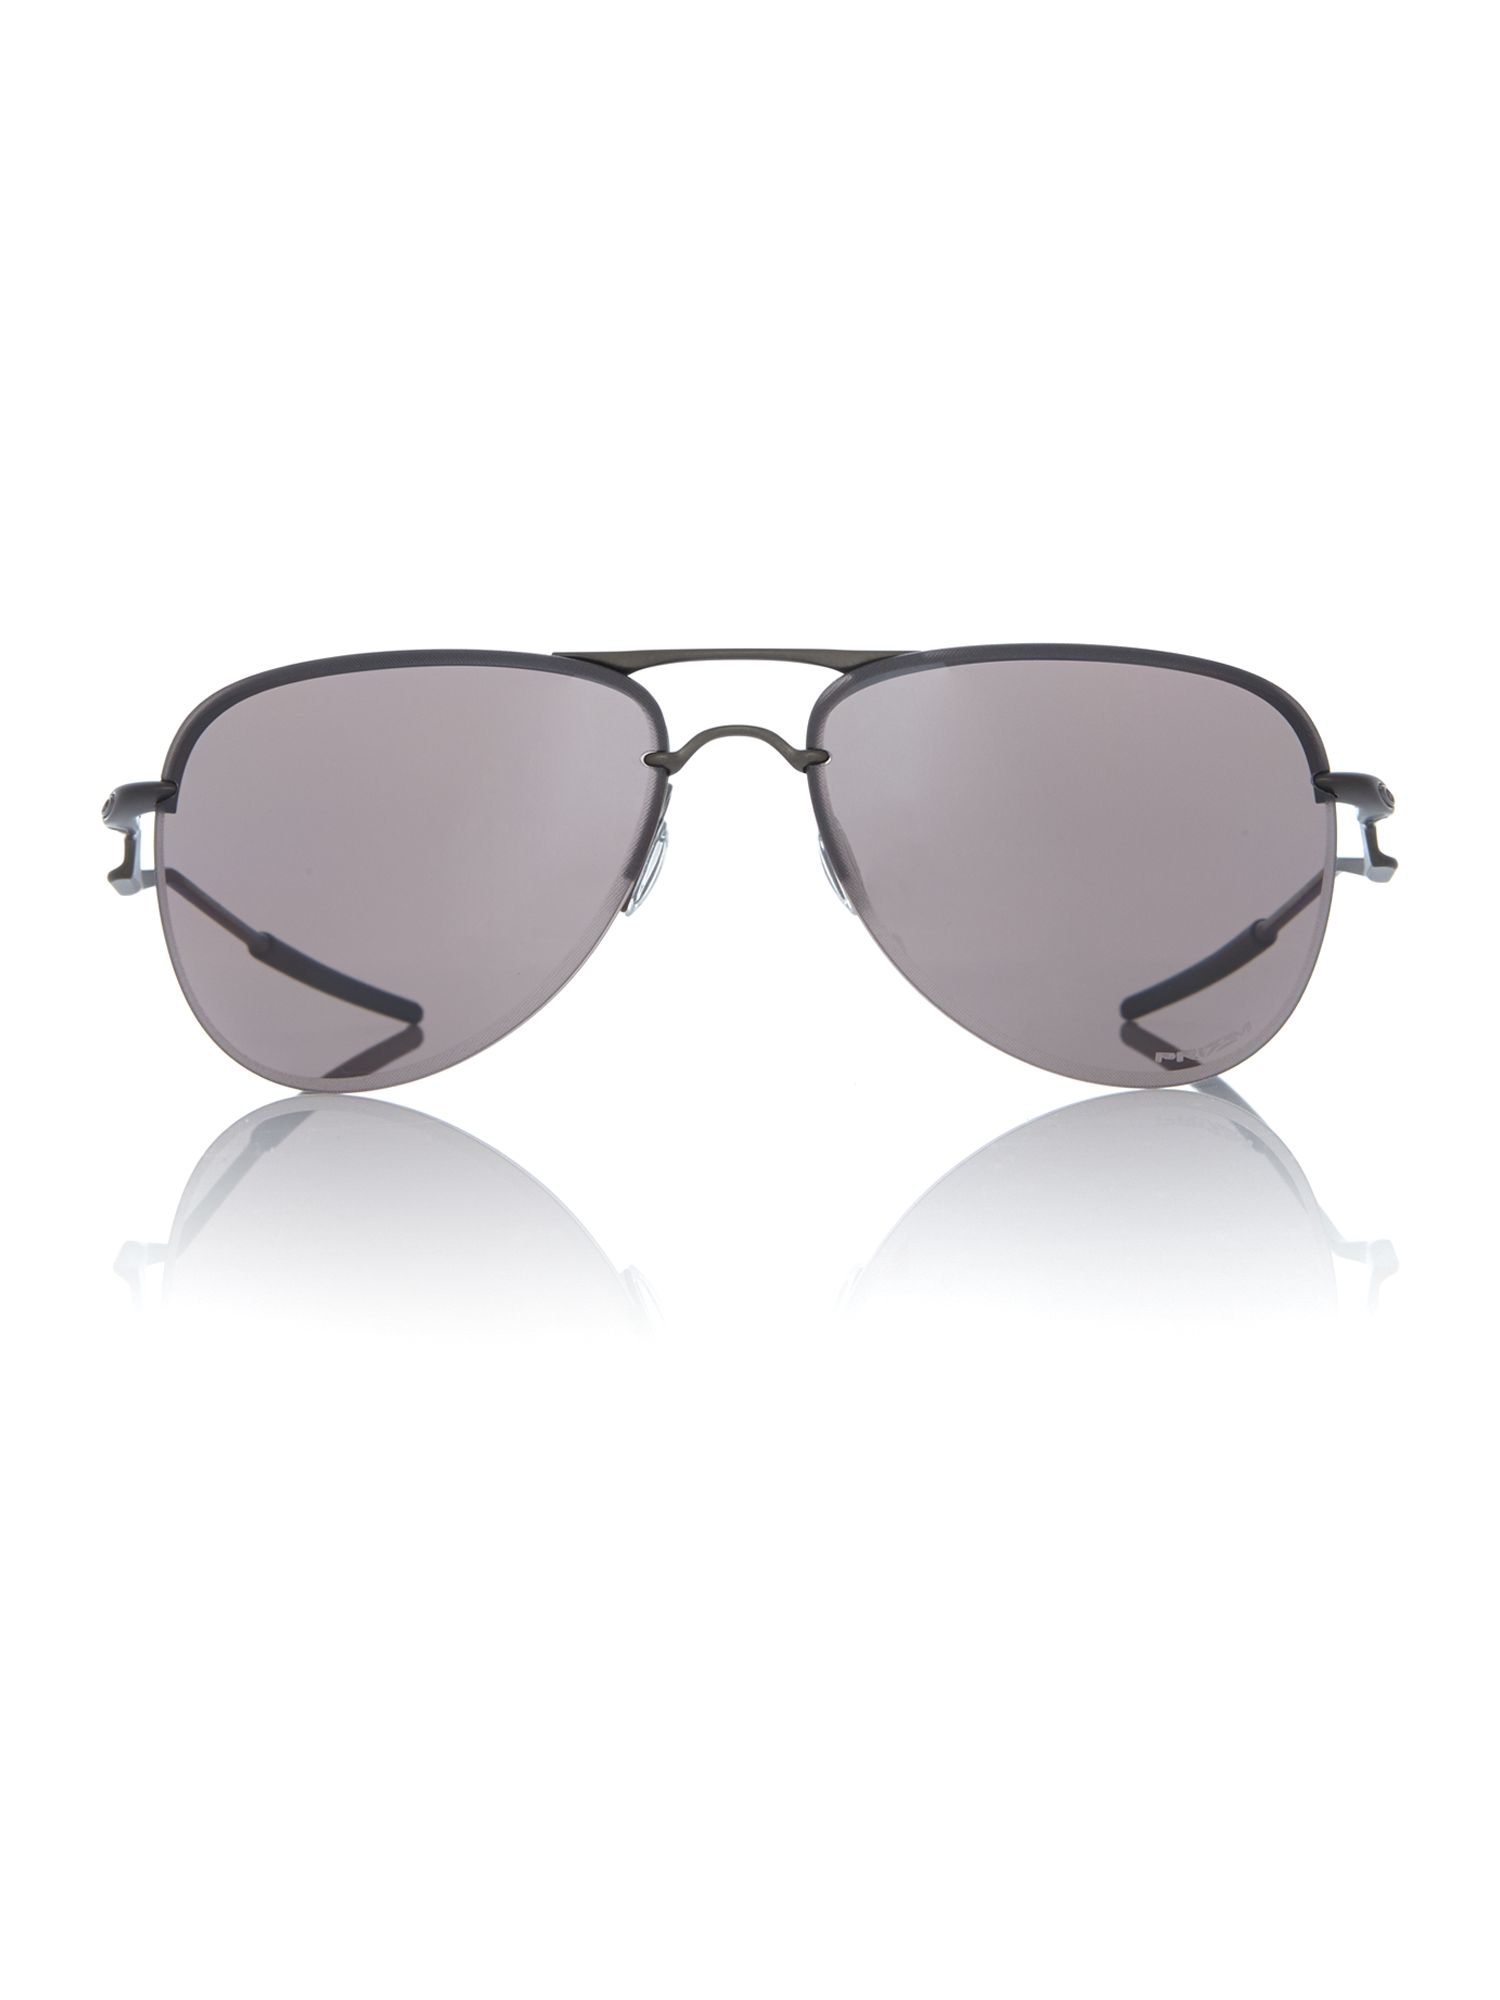 6564351dda4 Oakley Pilot Sunglasses « Heritage Malta